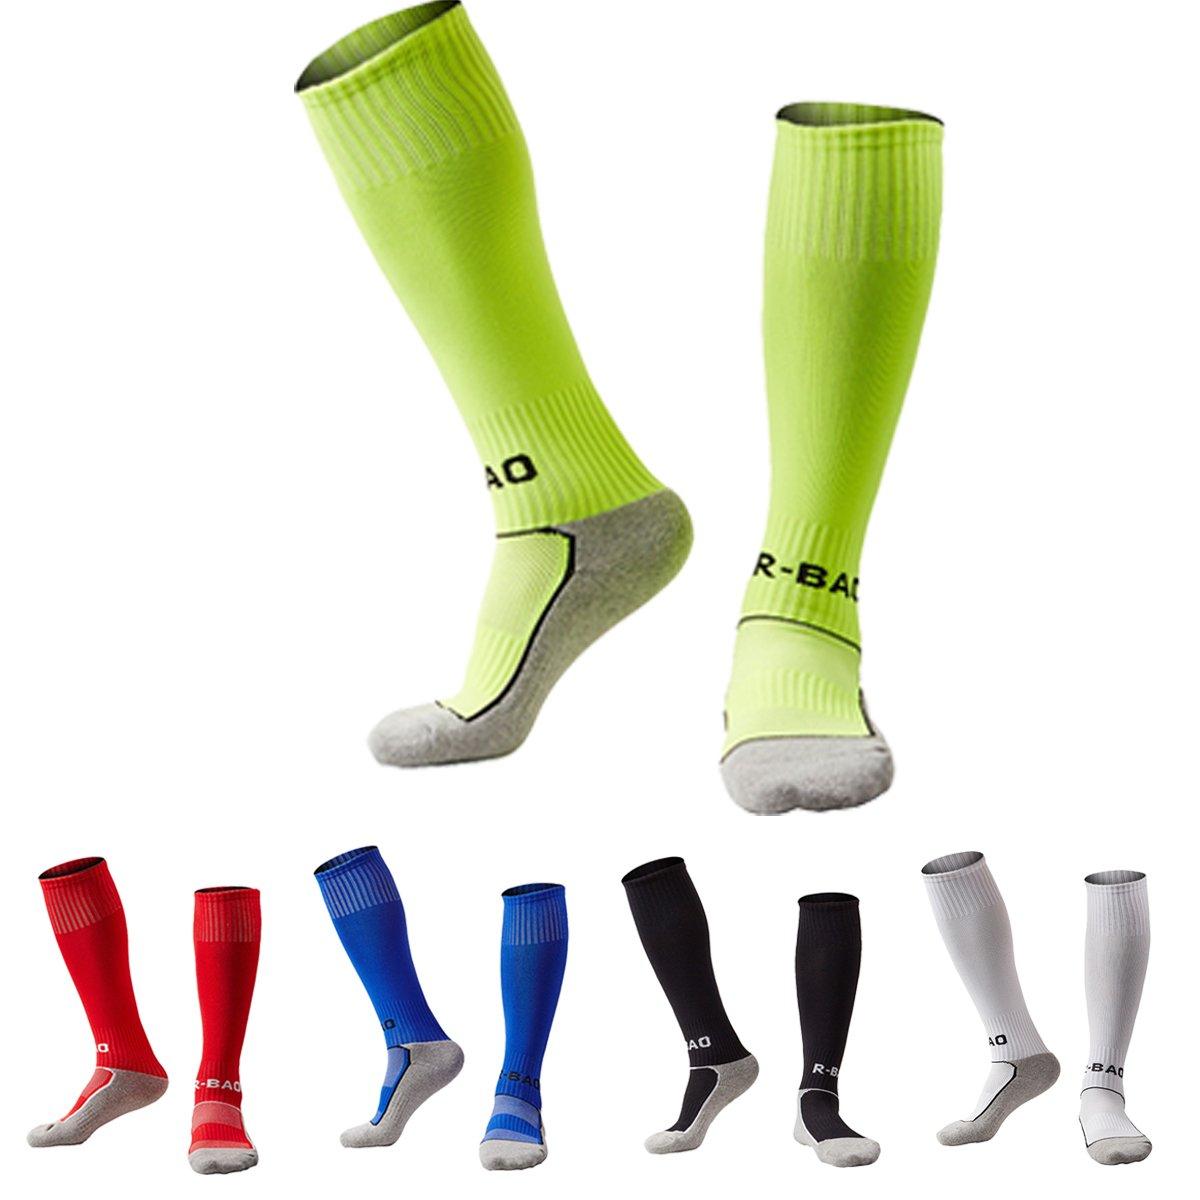 Kalakids SOCKSHOSIERY ボーイズ B0734J28PN Lime Green / Red / Royalblue / Black / White Lime Green / Red / Royalblue / Black / White